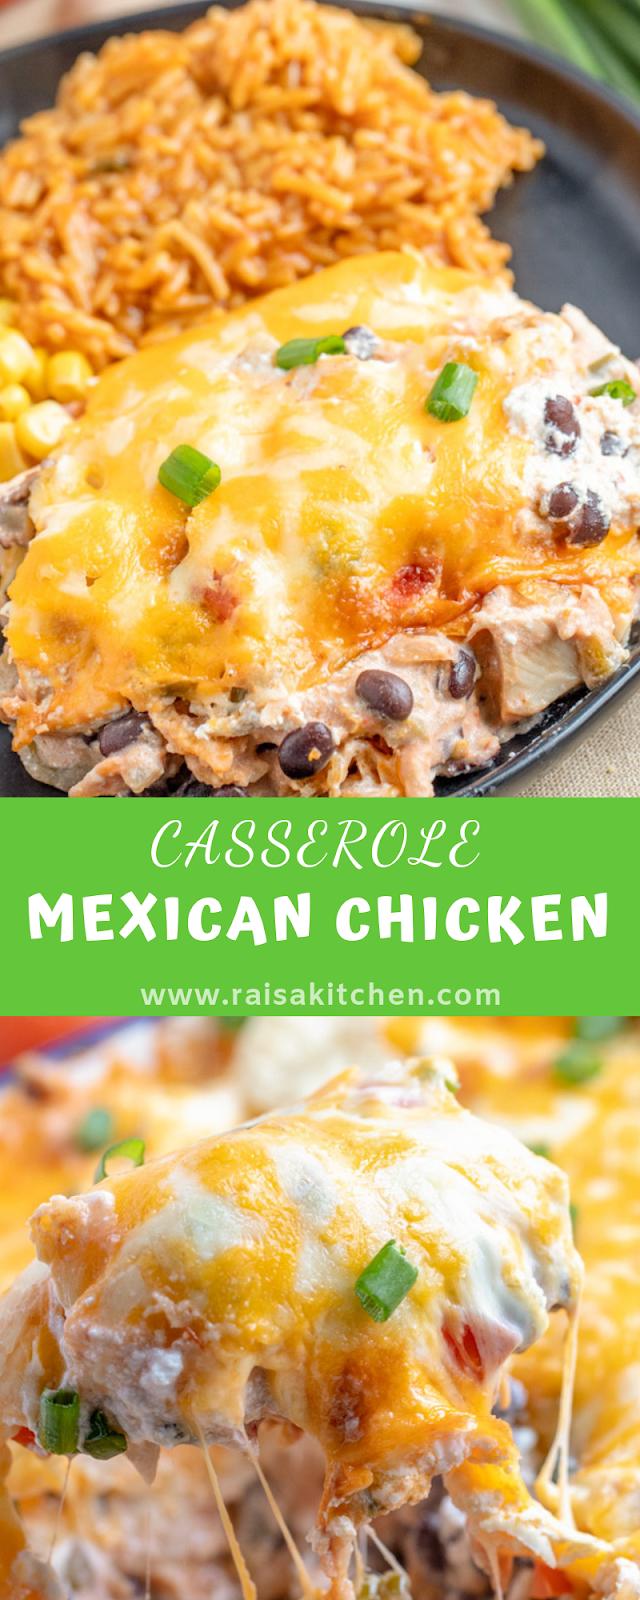 Mexican Chicken Casserole Mexican Chicken Mexican Chicken Casserole Chicken Casserole